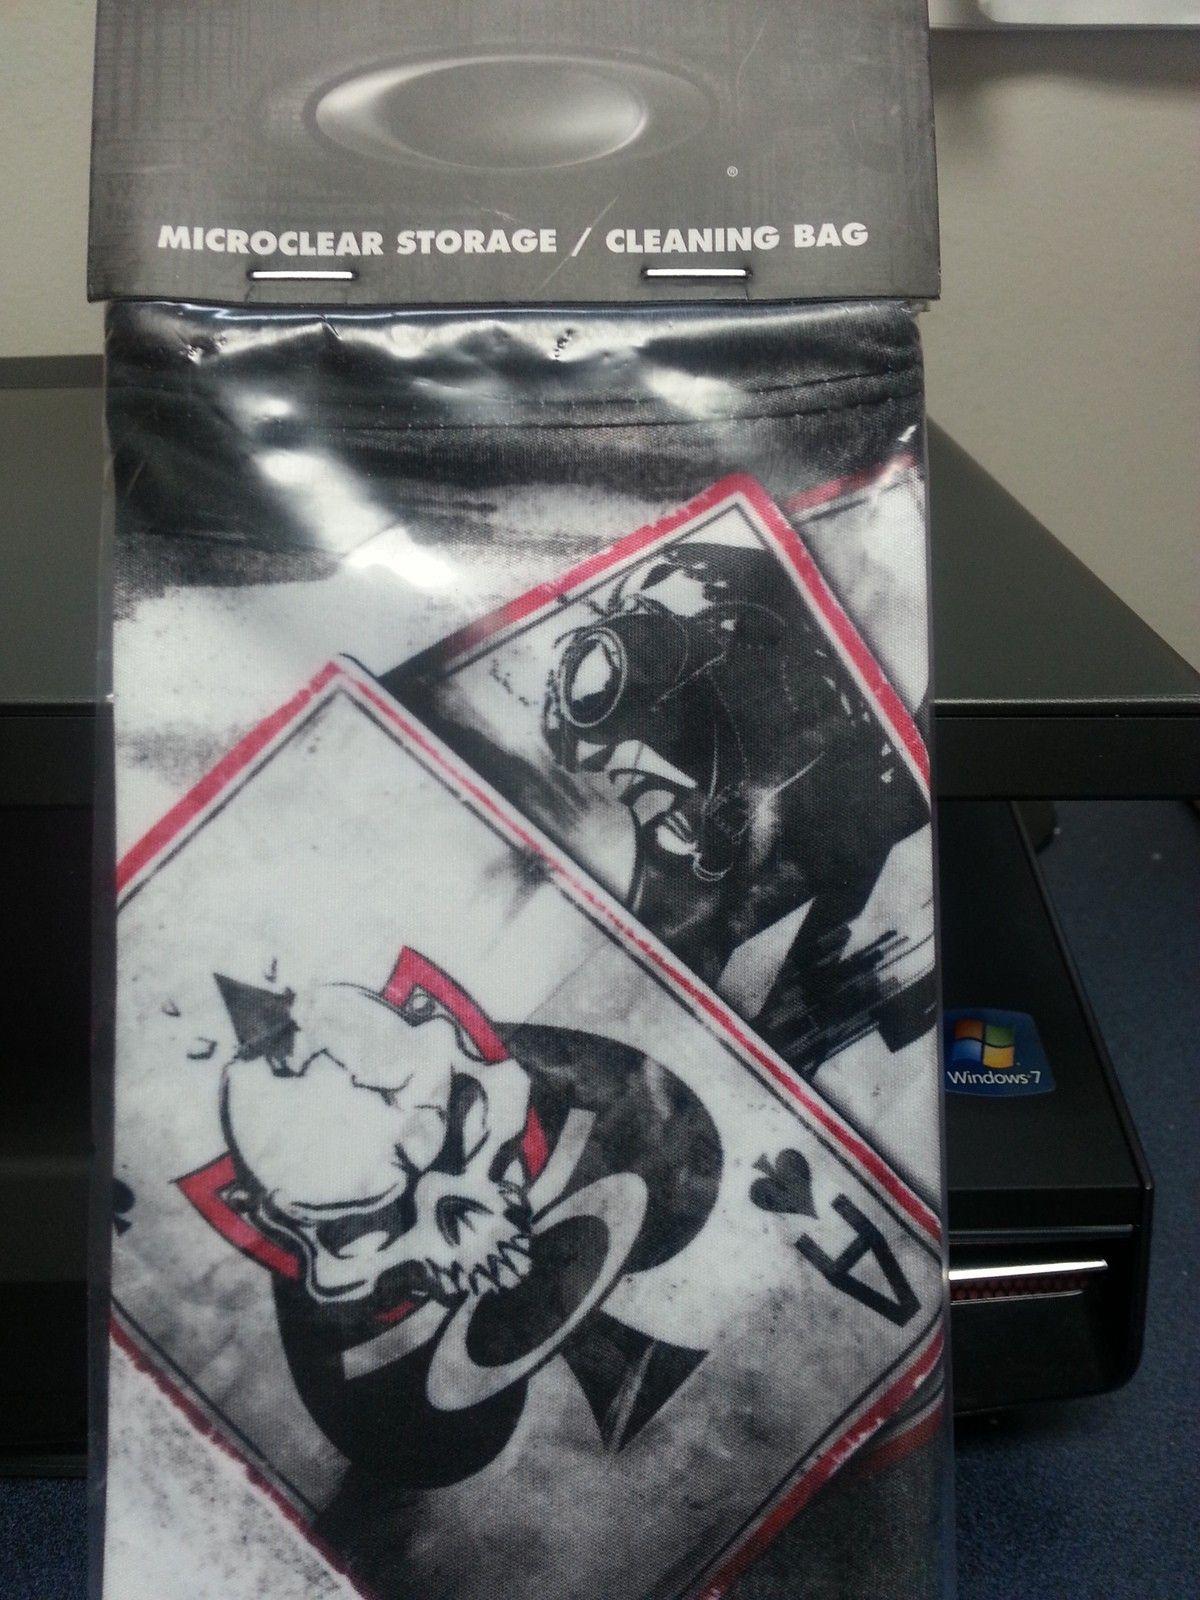 Pit Boss 2 (with LV bag) for Badman Dark Carbon/Pol. Black Lens - 20150430_133401.jpg